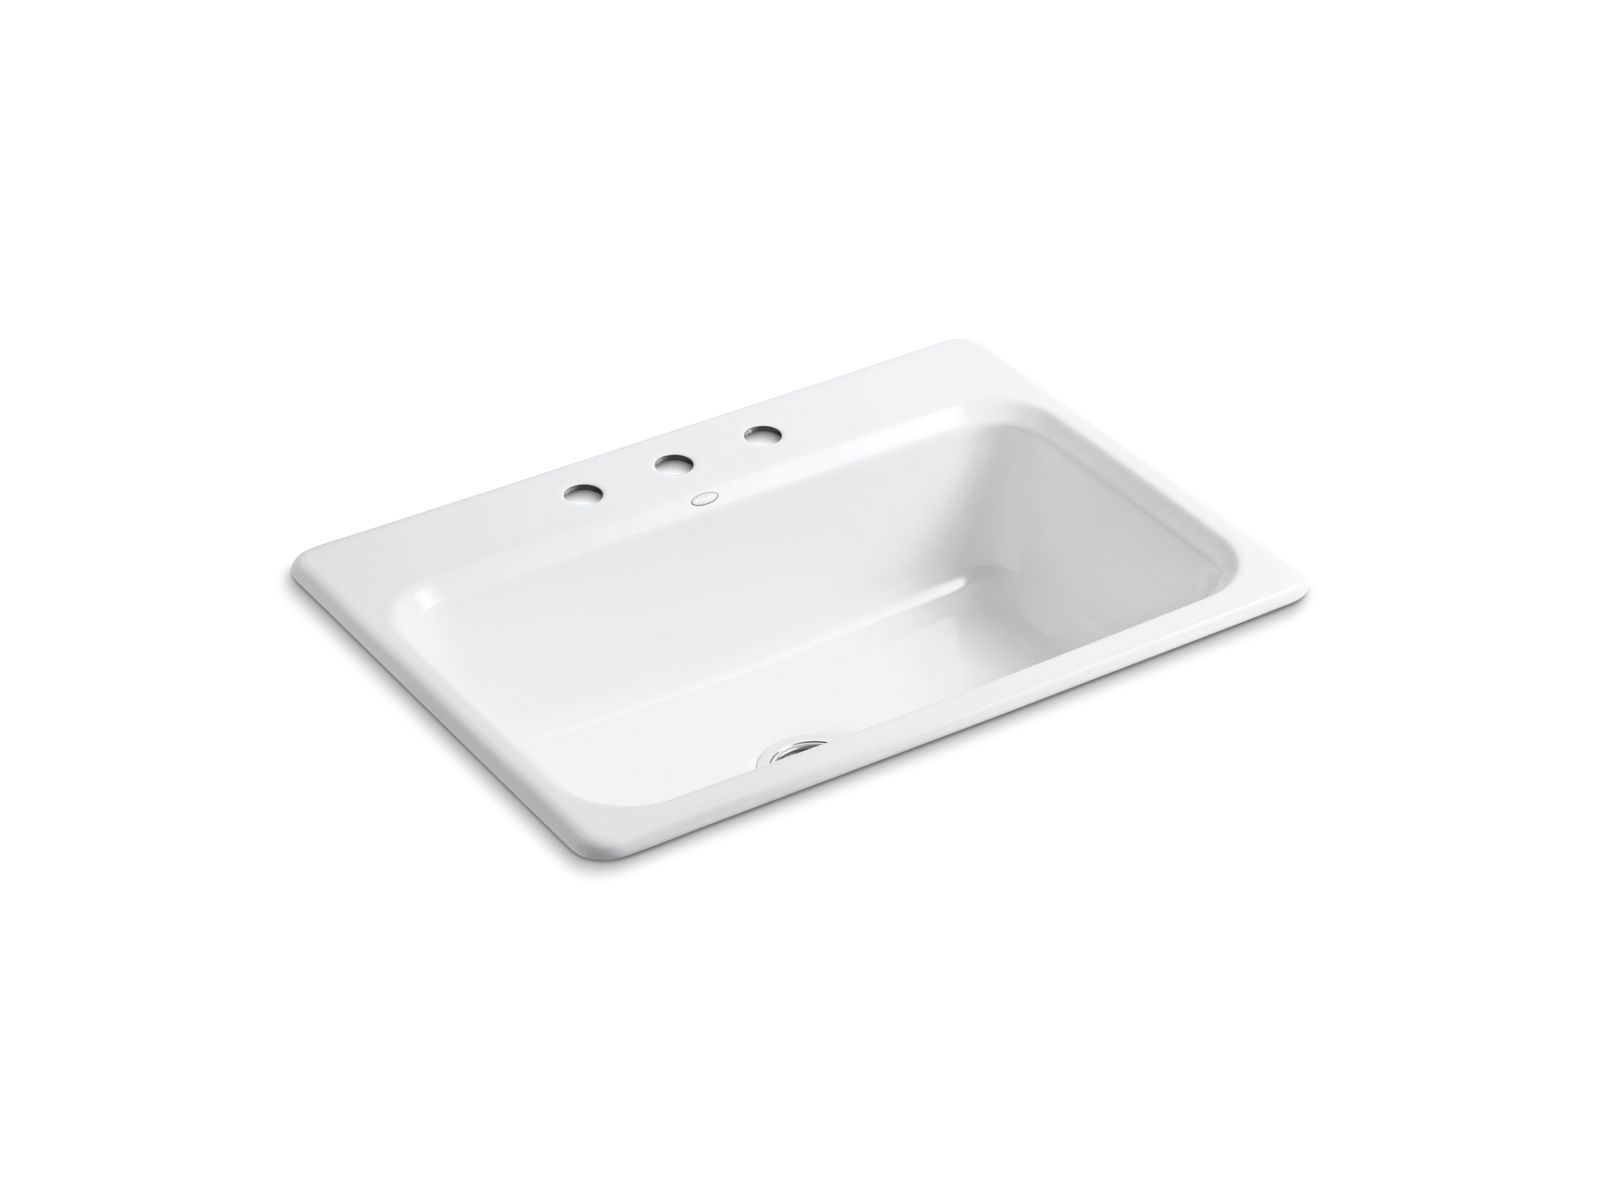 Charmant Bakersfield Top Mount Kitchen Sink W/ Three Faucet Holes | K 5832 3 | KOHLER